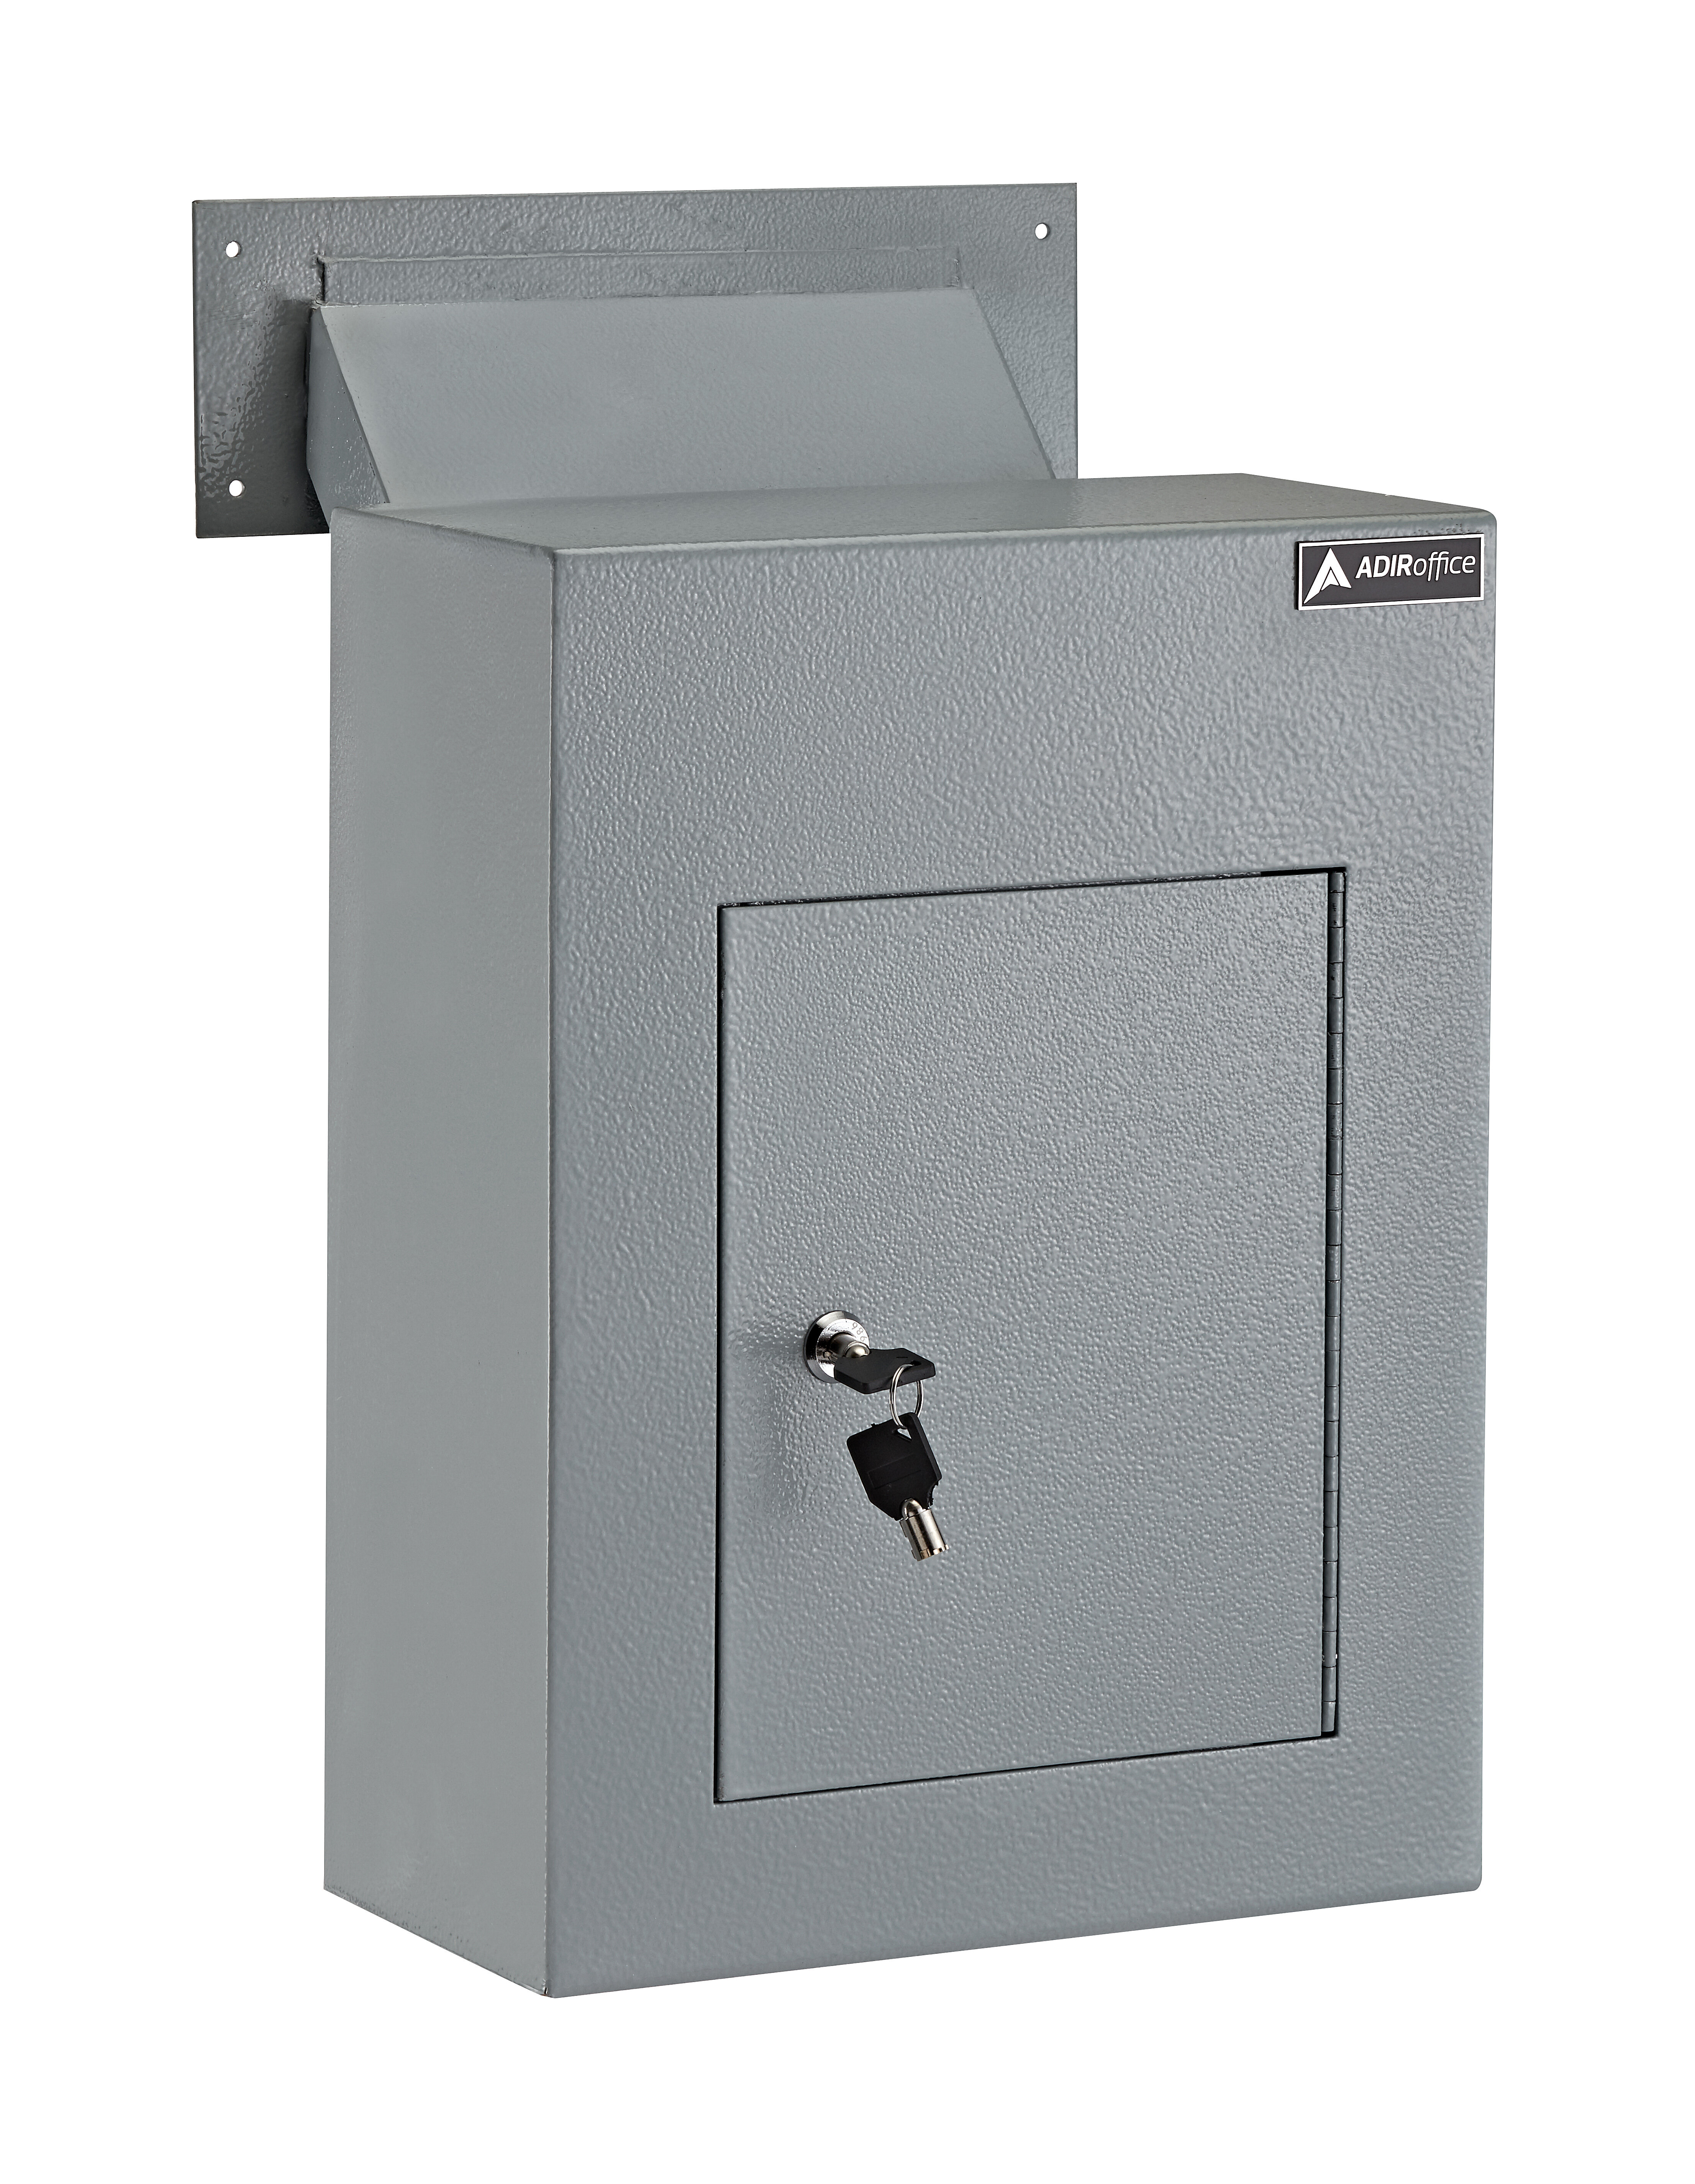 Adiroffice Through The Wall Drop Box Depository Safe With Key Lock Wayfair Ca